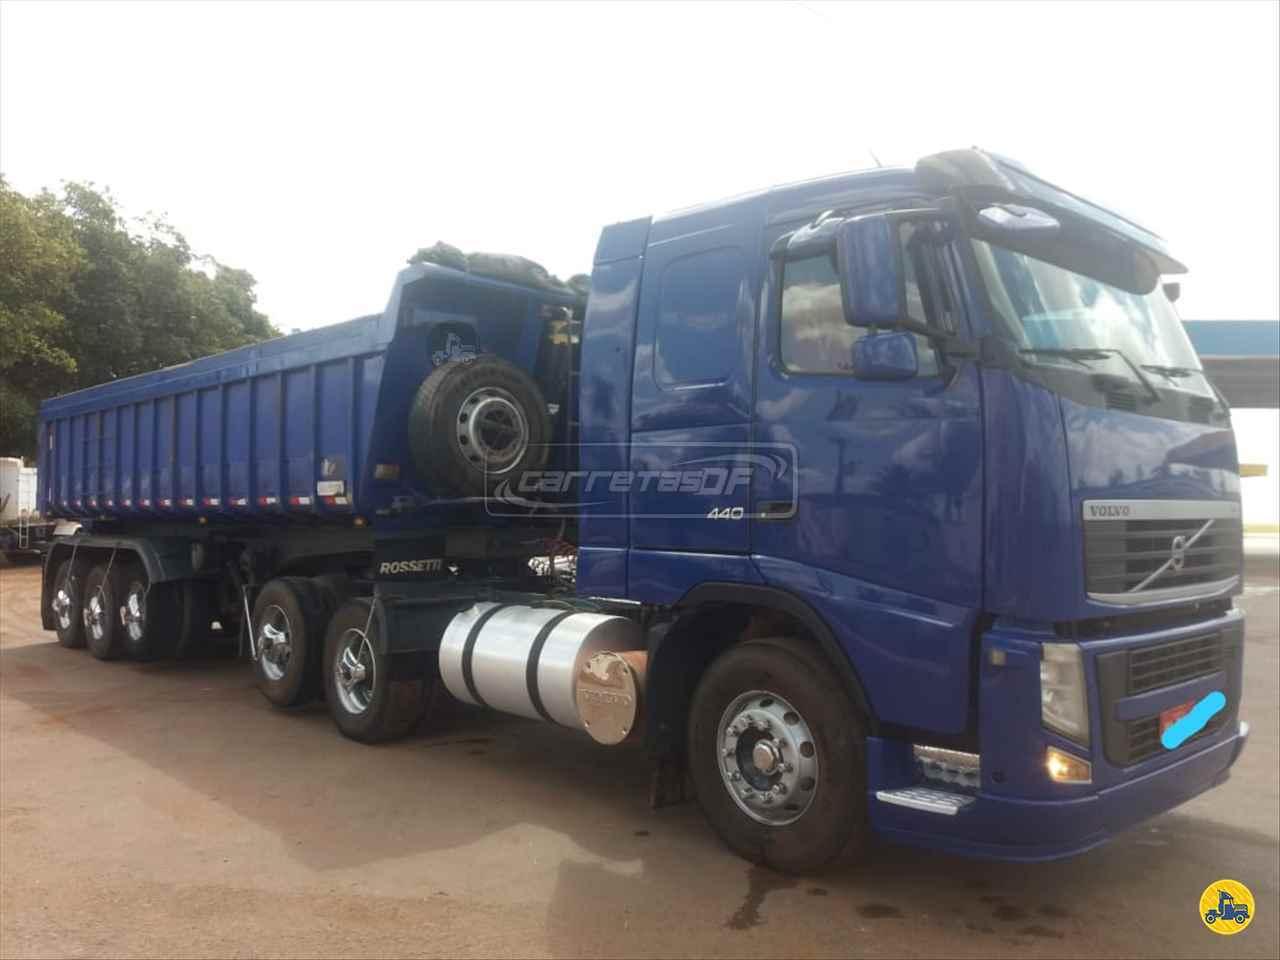 CAMINHAO VOLVO VOLVO FH 440 Cavalo Mecânico Truck 6x2 CARRETAS DF - NOMA BRASILIA DISTRITO FEDERAL DF